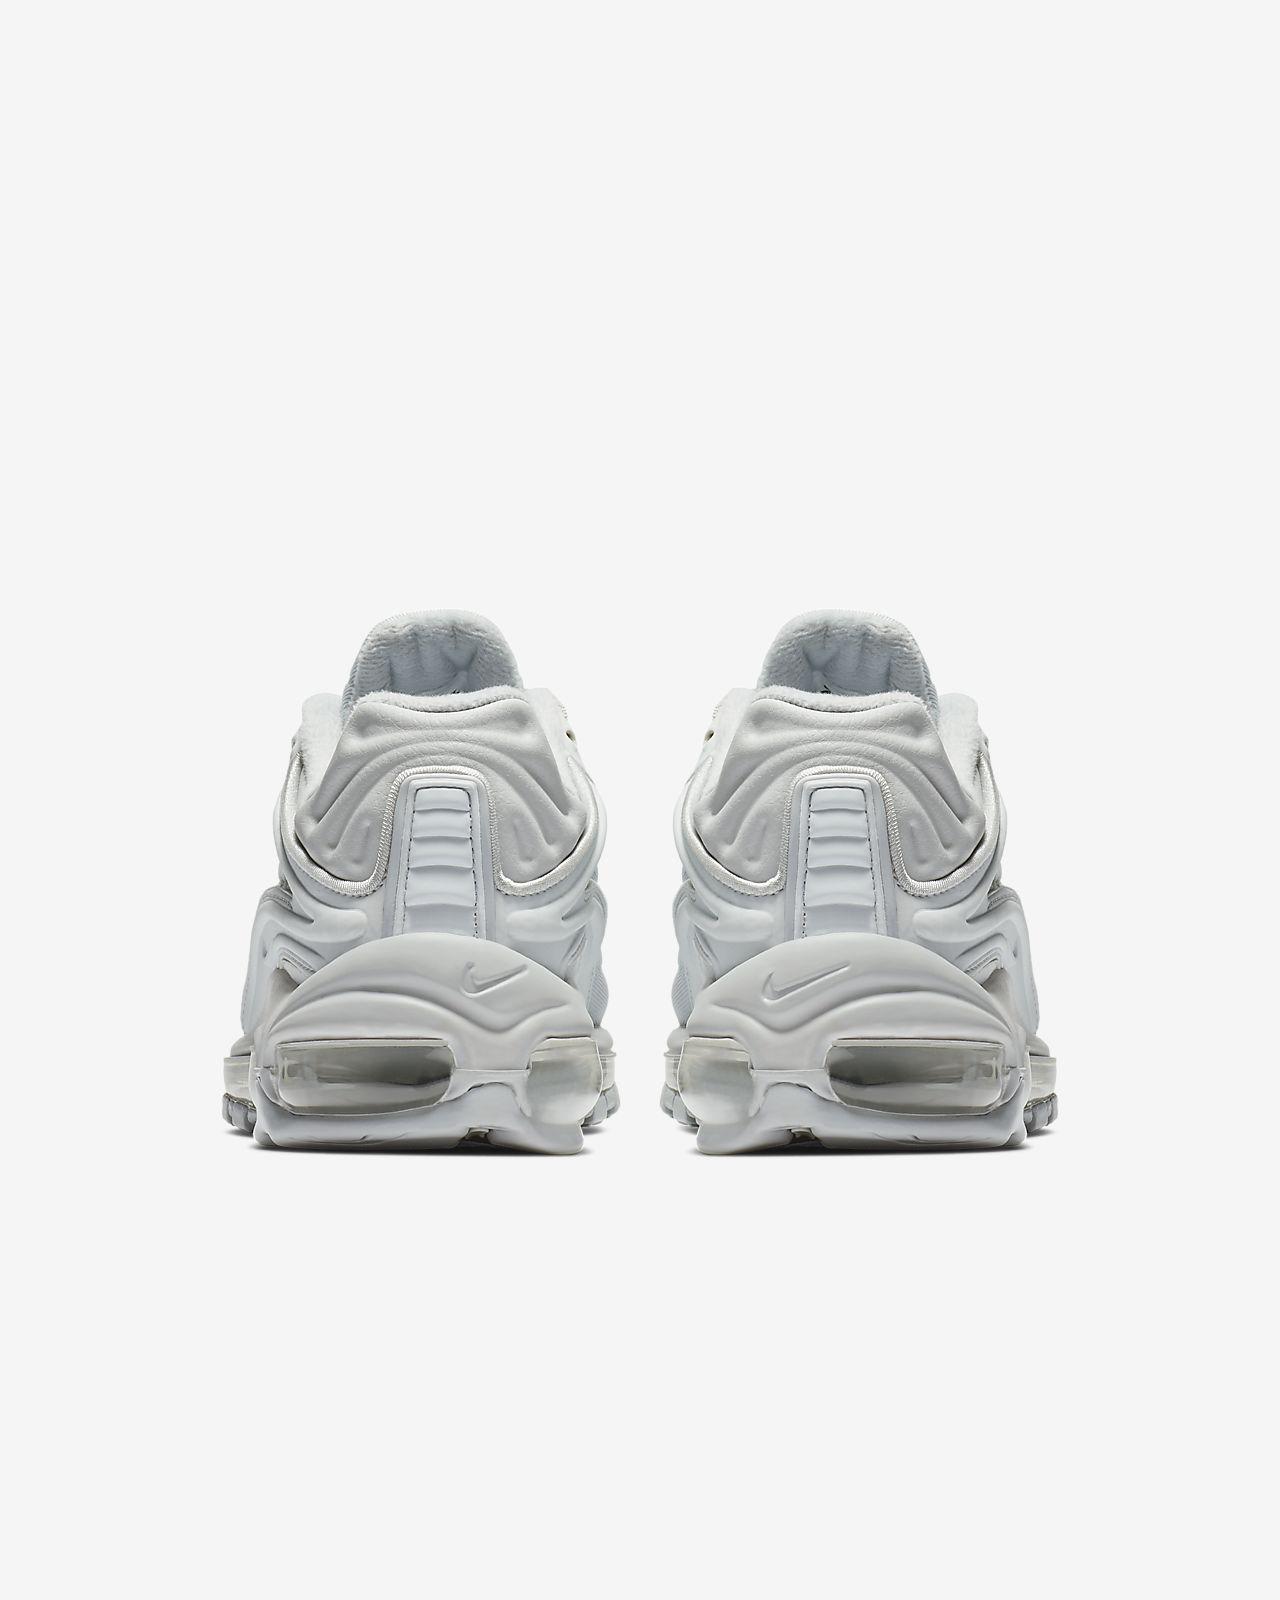 6c01b5430d Nike Air Max Deluxe SE Women's Shoe